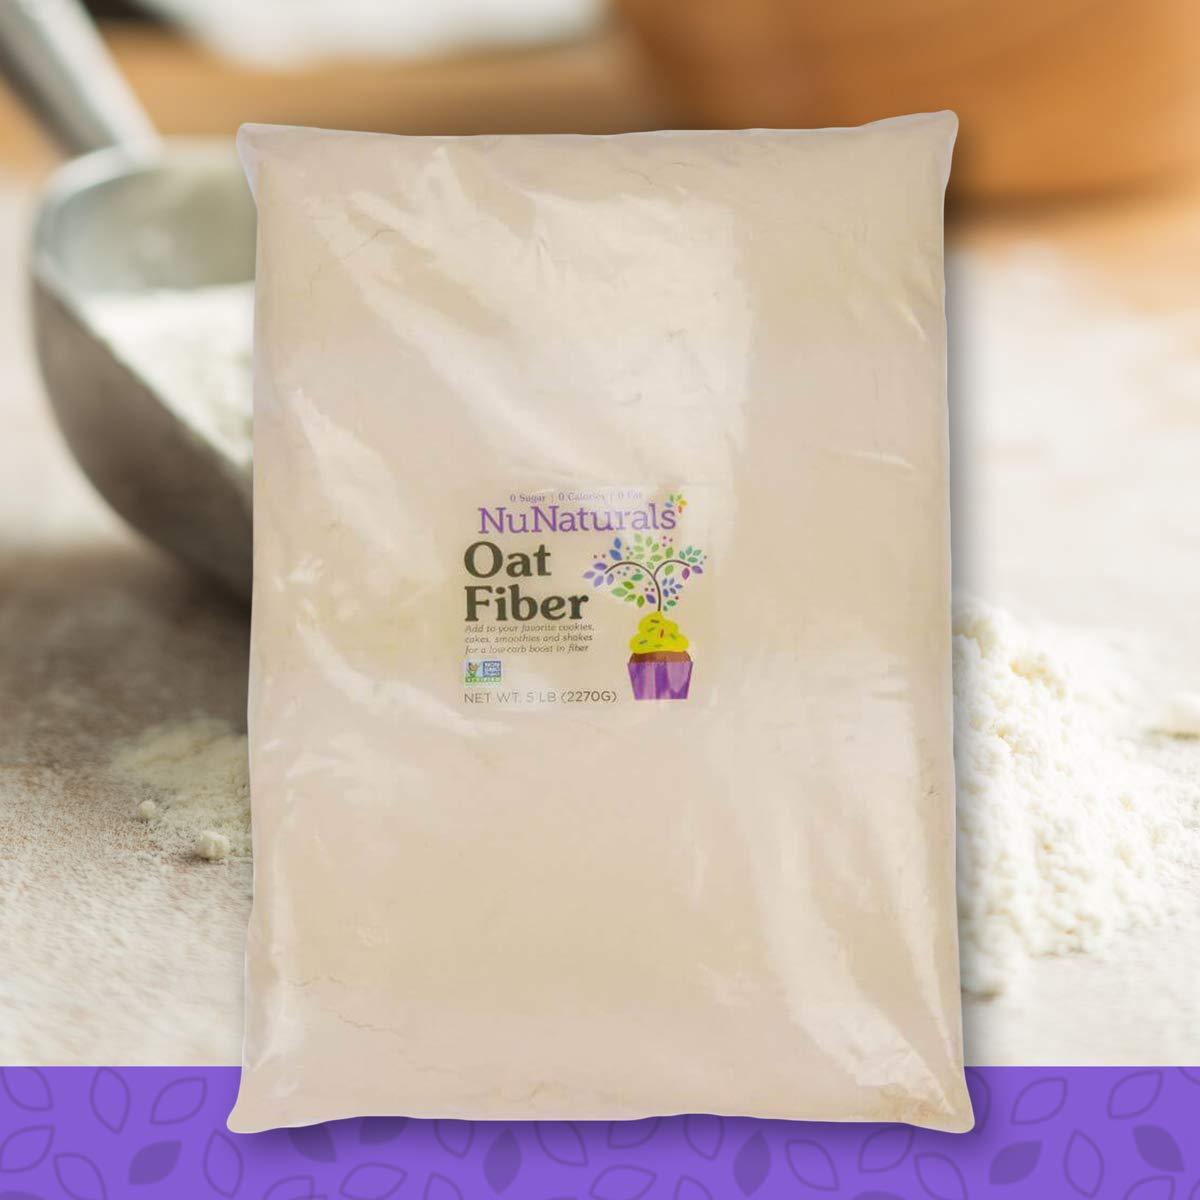 NuNaturals All Natural Oat Fiber, Non-GMO Certified, 755 Servings (5 lbs)